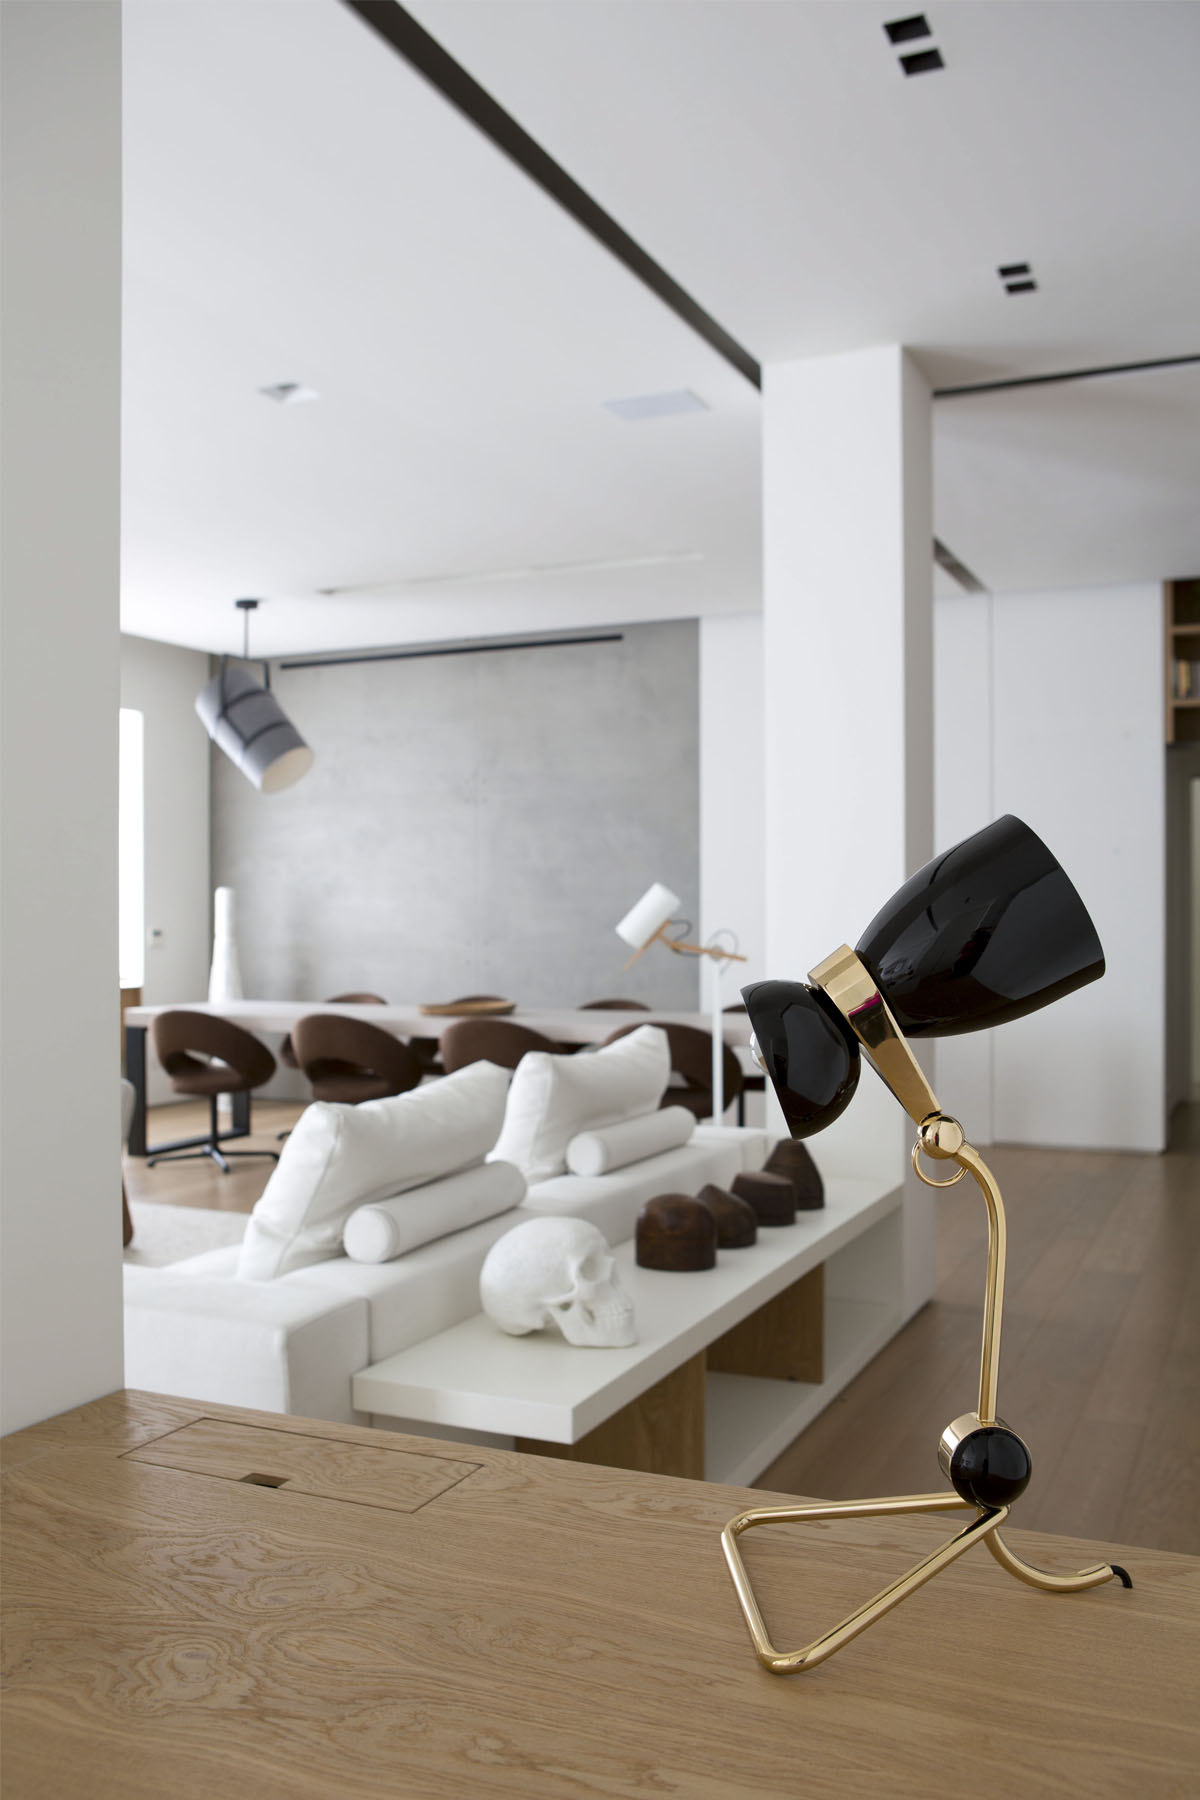 12 bonucci Sleek Modern by Fabio Fantolino